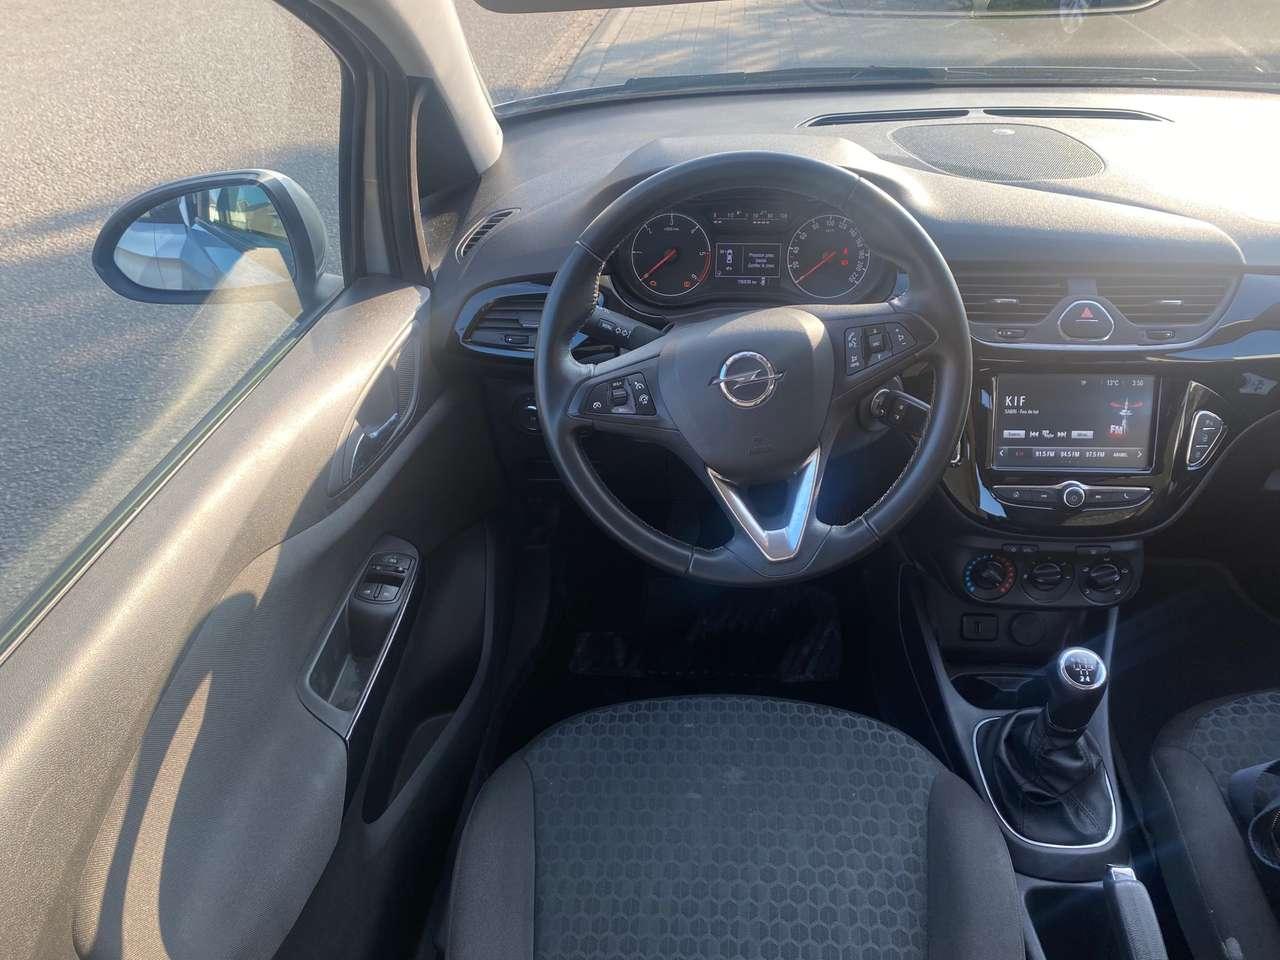 Opel Corsa 1.3 CDTI 95cv Navi,Tel, radar recul…5867 HTVA plein